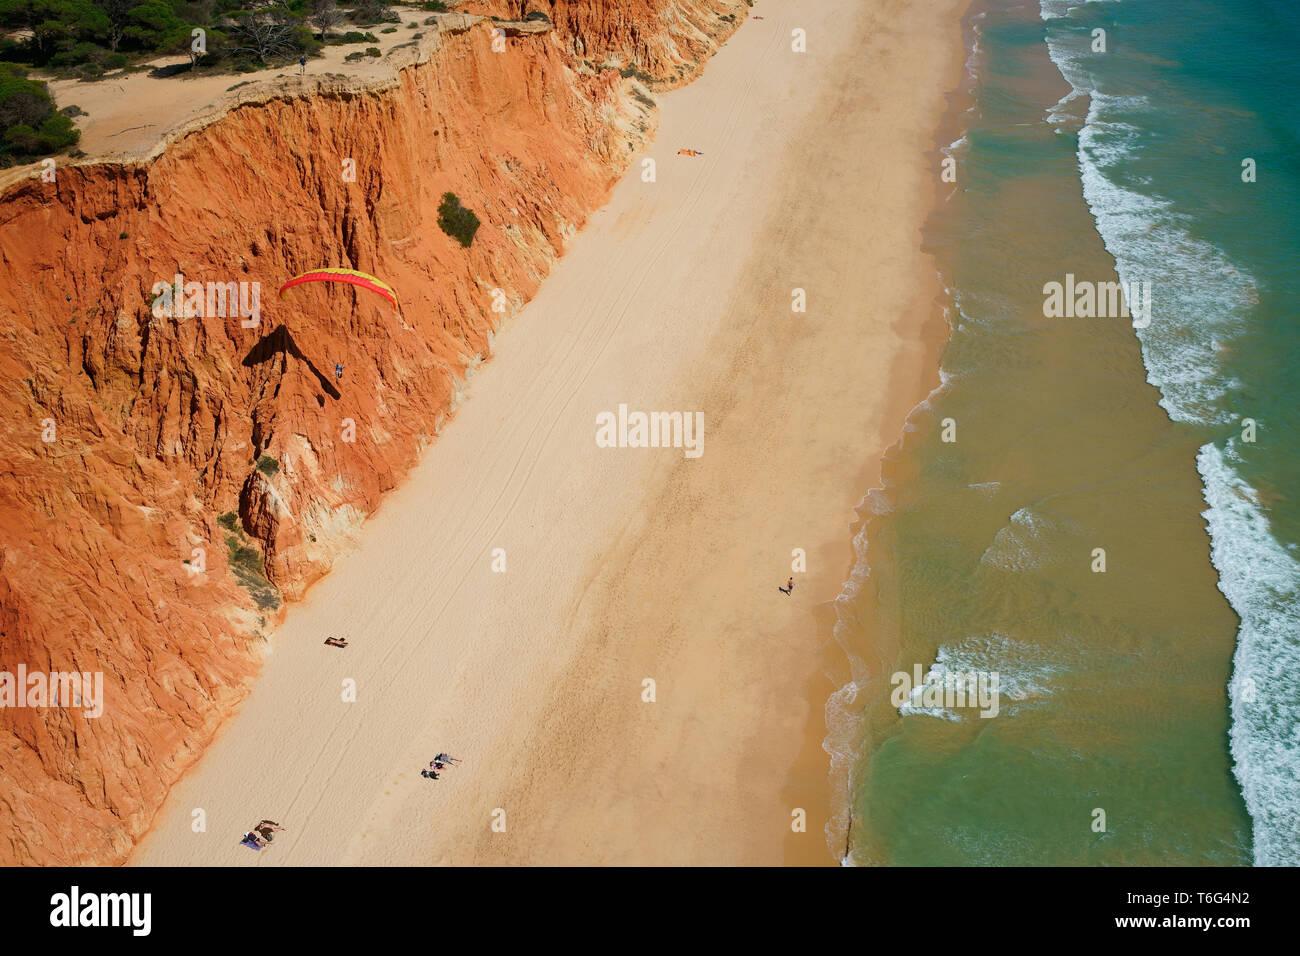 PARAGLIDER USING THE SEA BREEZE TO SOAR ALONGSIDE A COLORFUL SEASIDE CLIFF (aerial view). Praia da Falésia, Albufeira, Algarve, Portugal. Stock Photo